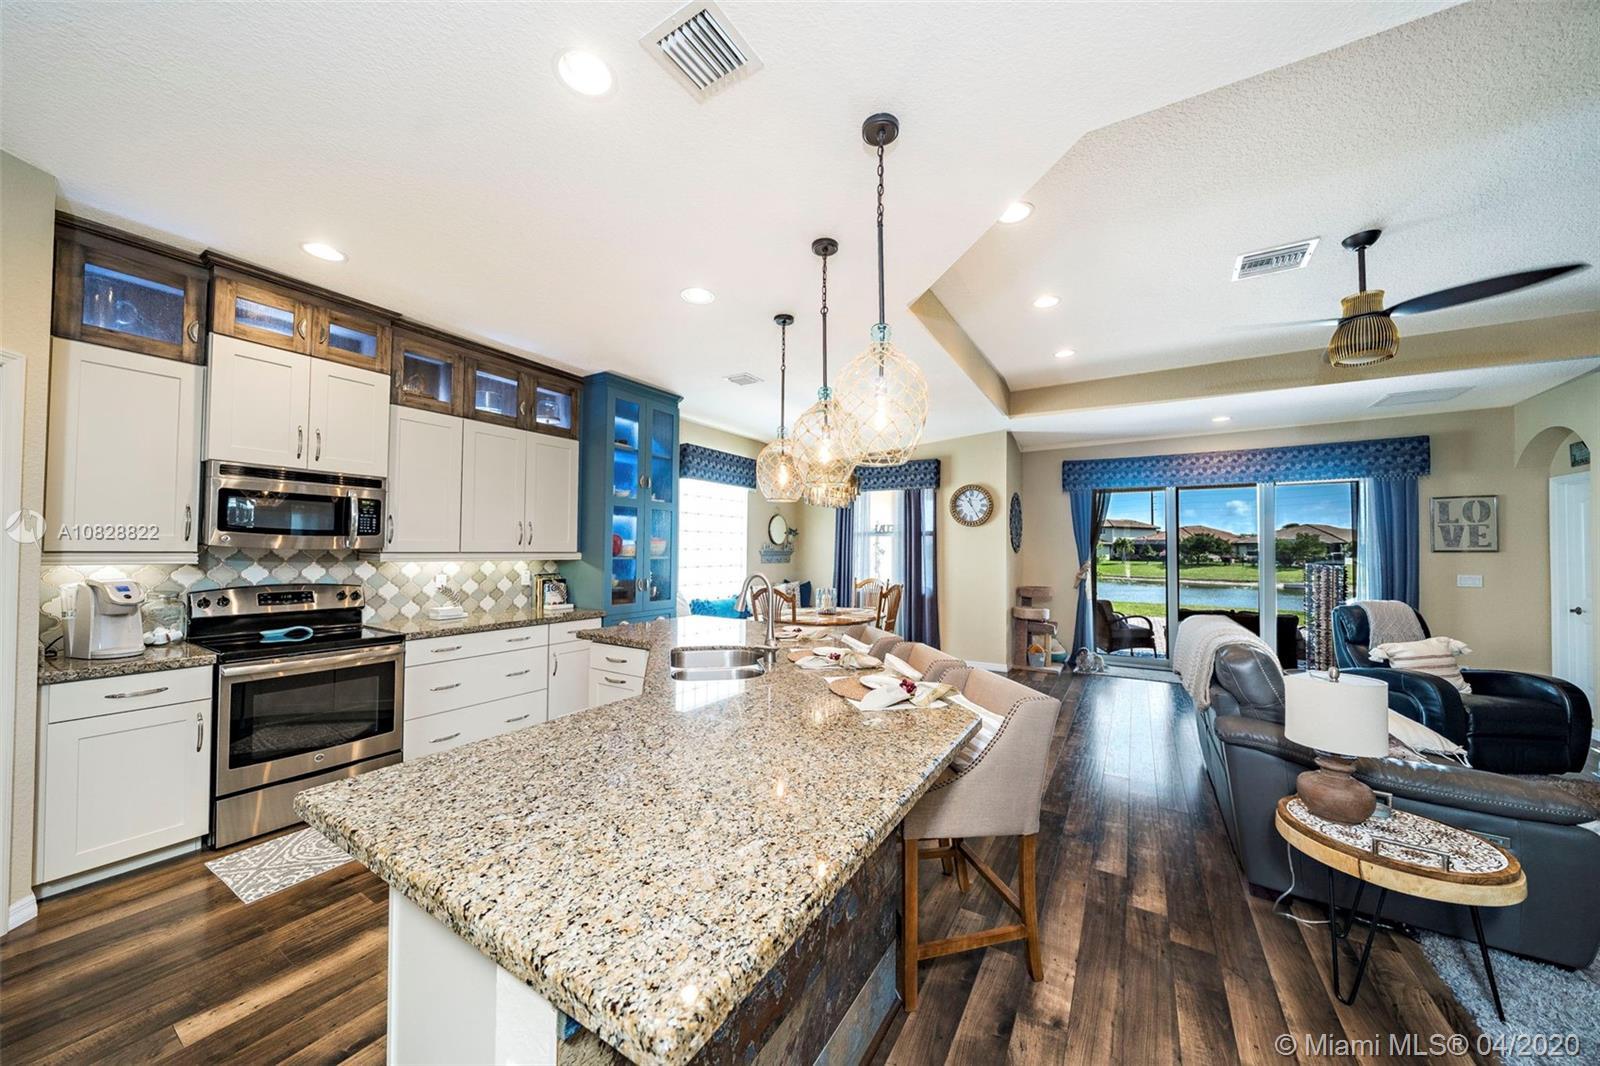 7148 Damita Dr, Lake Worth, FL 33463 - Lake Worth, FL real estate listing